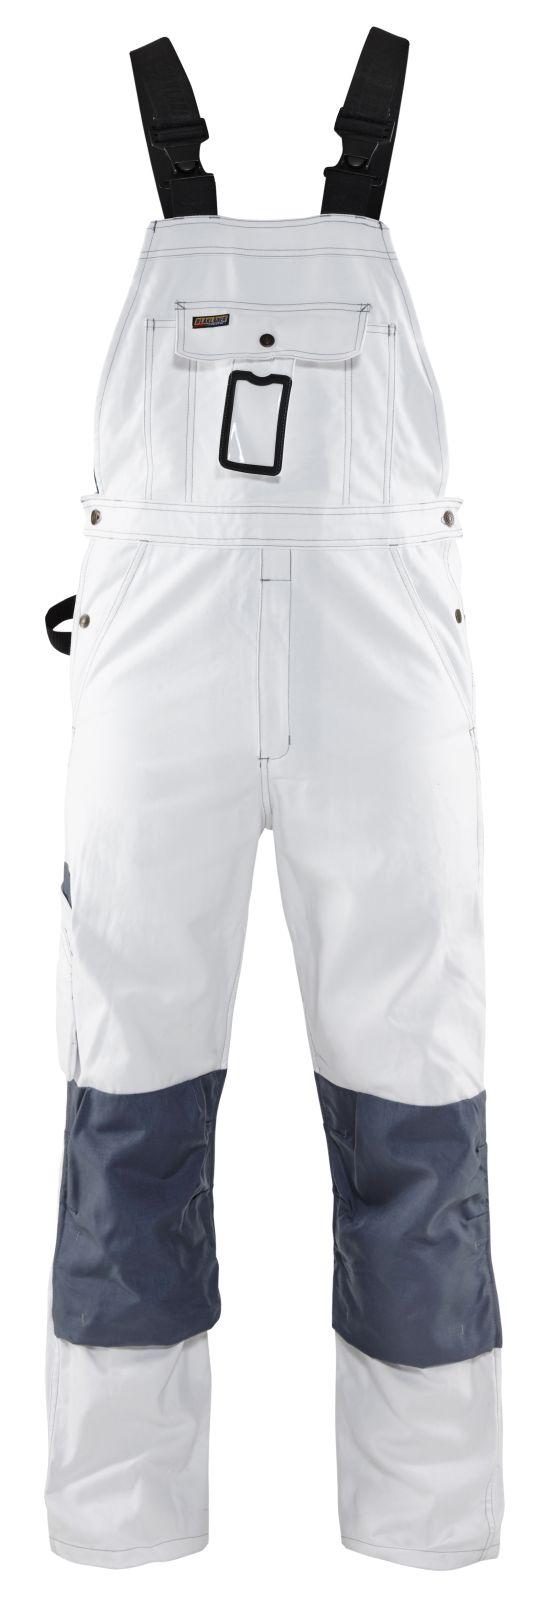 Blaklader Amerikaanse overalls 26111210 wit(1000)